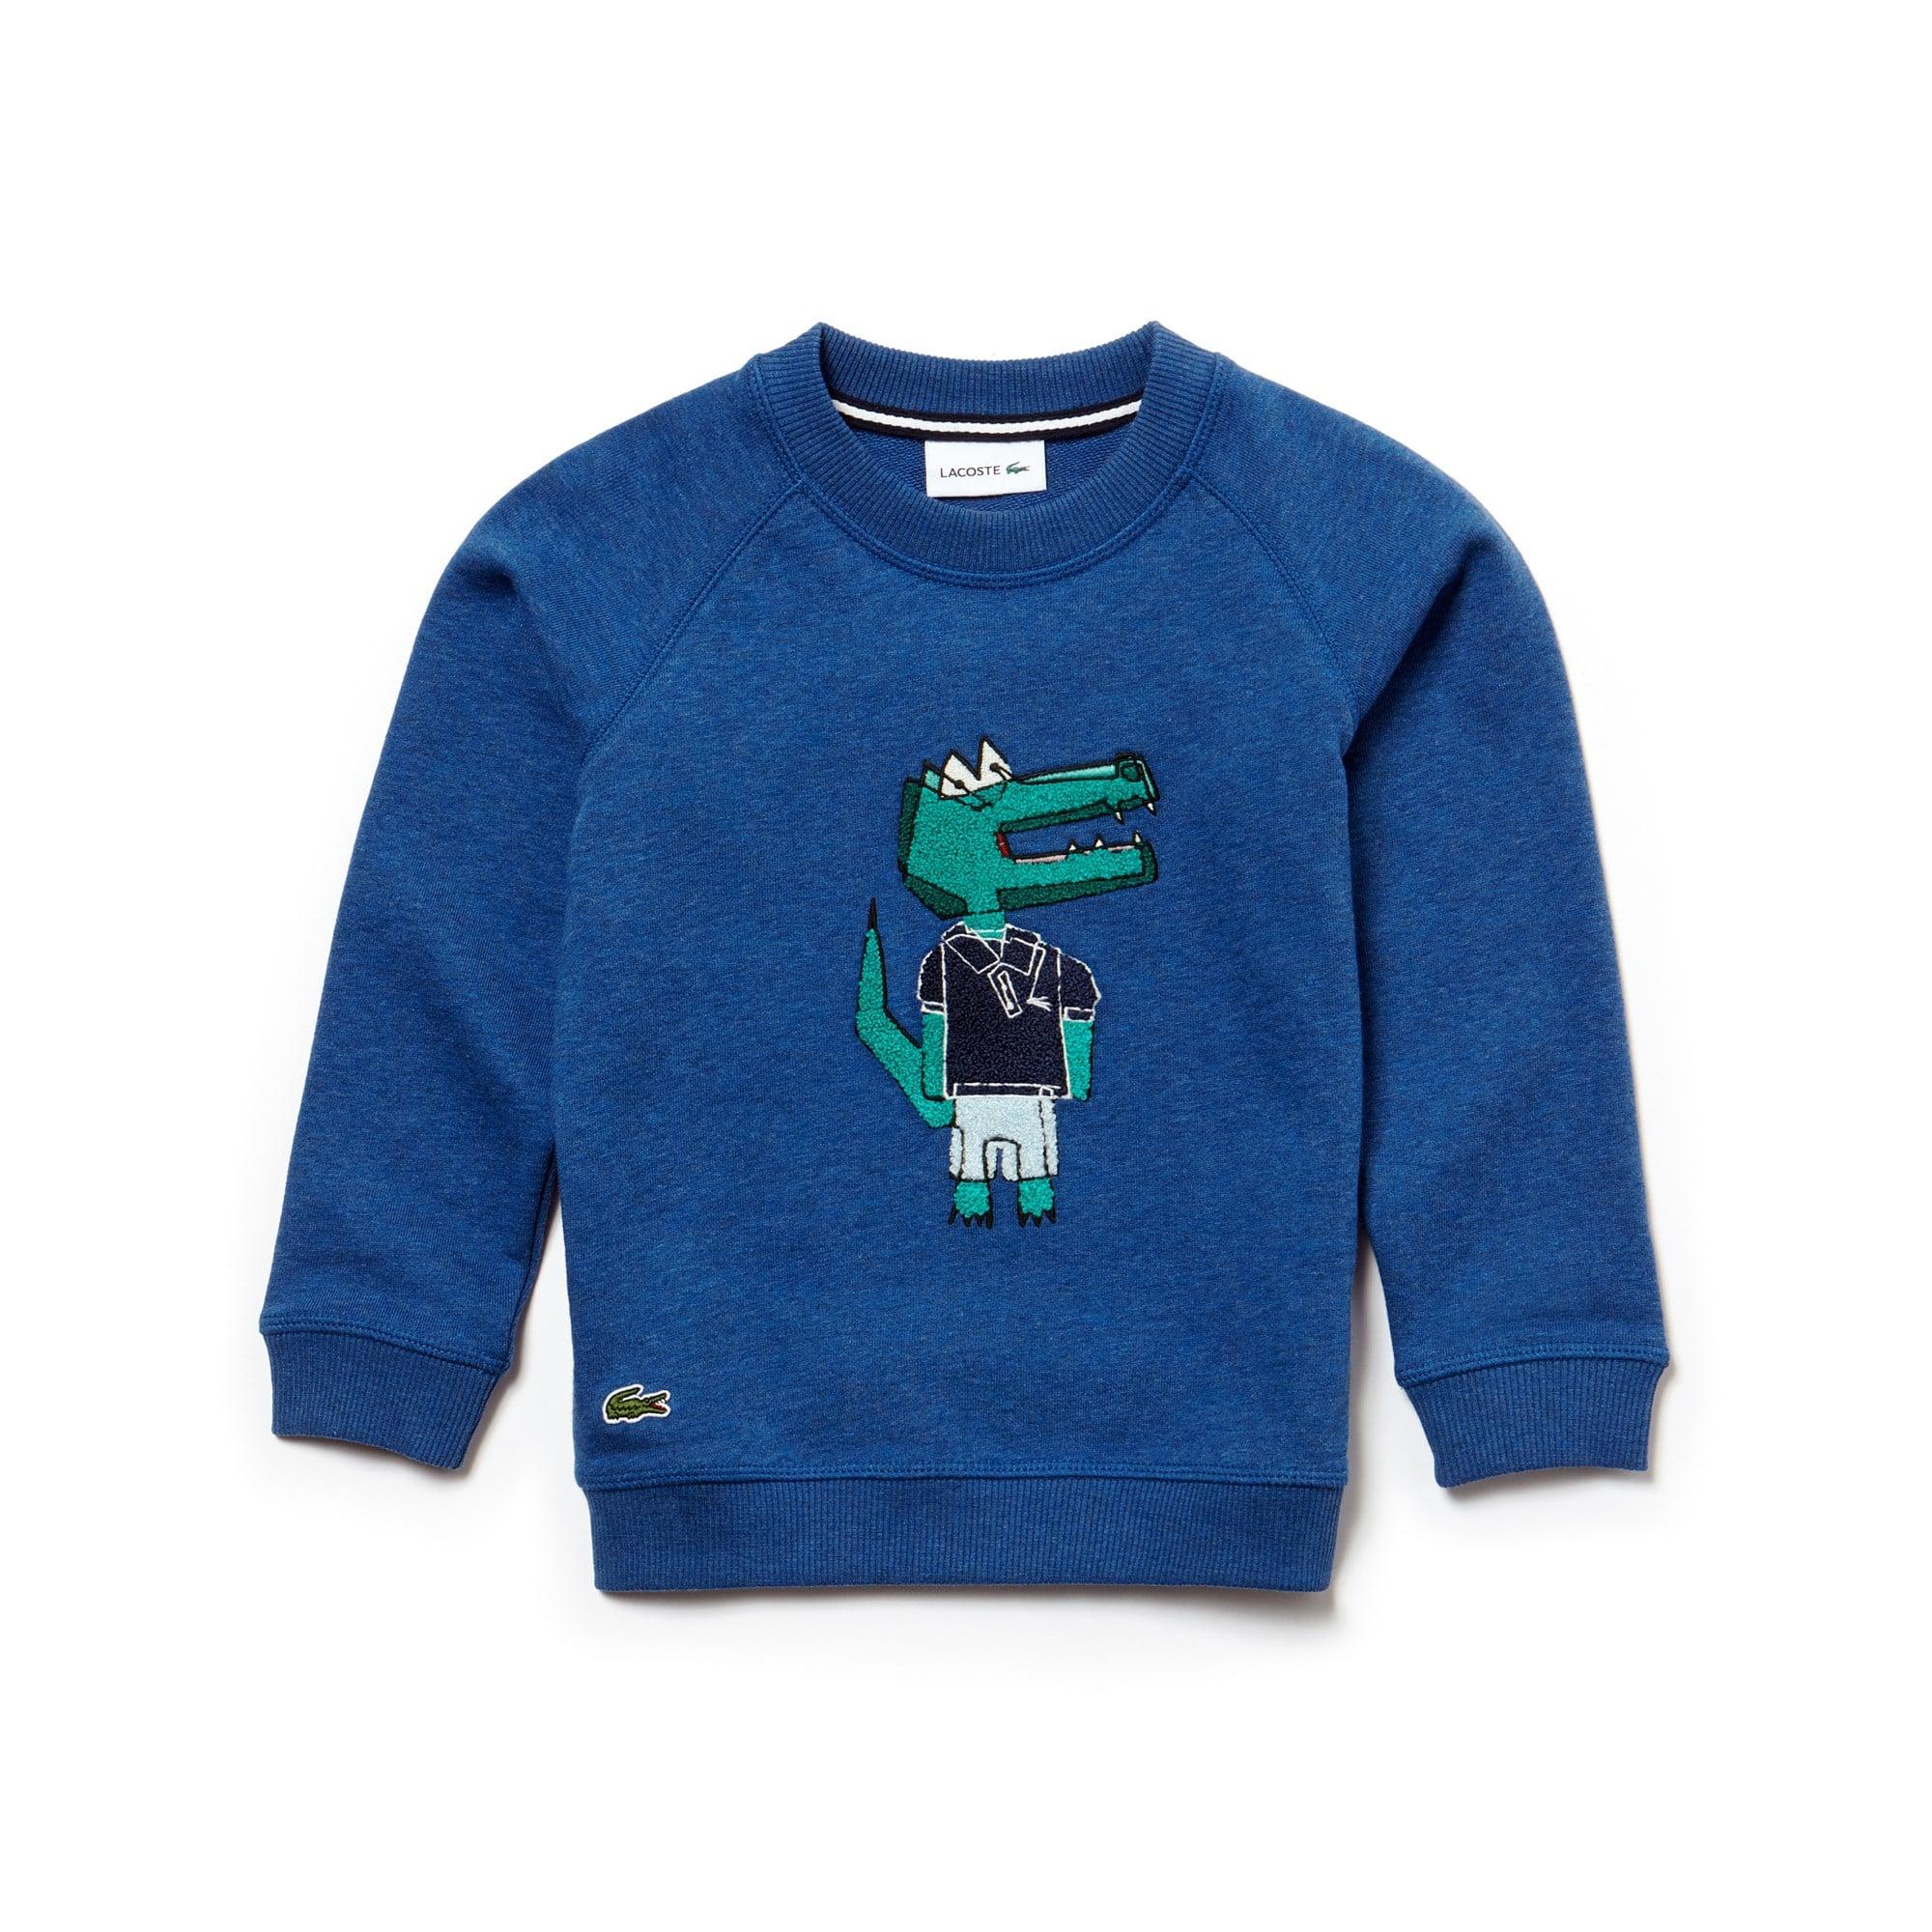 Sweatshirt jongens ronde nek krokodil indigo fleece